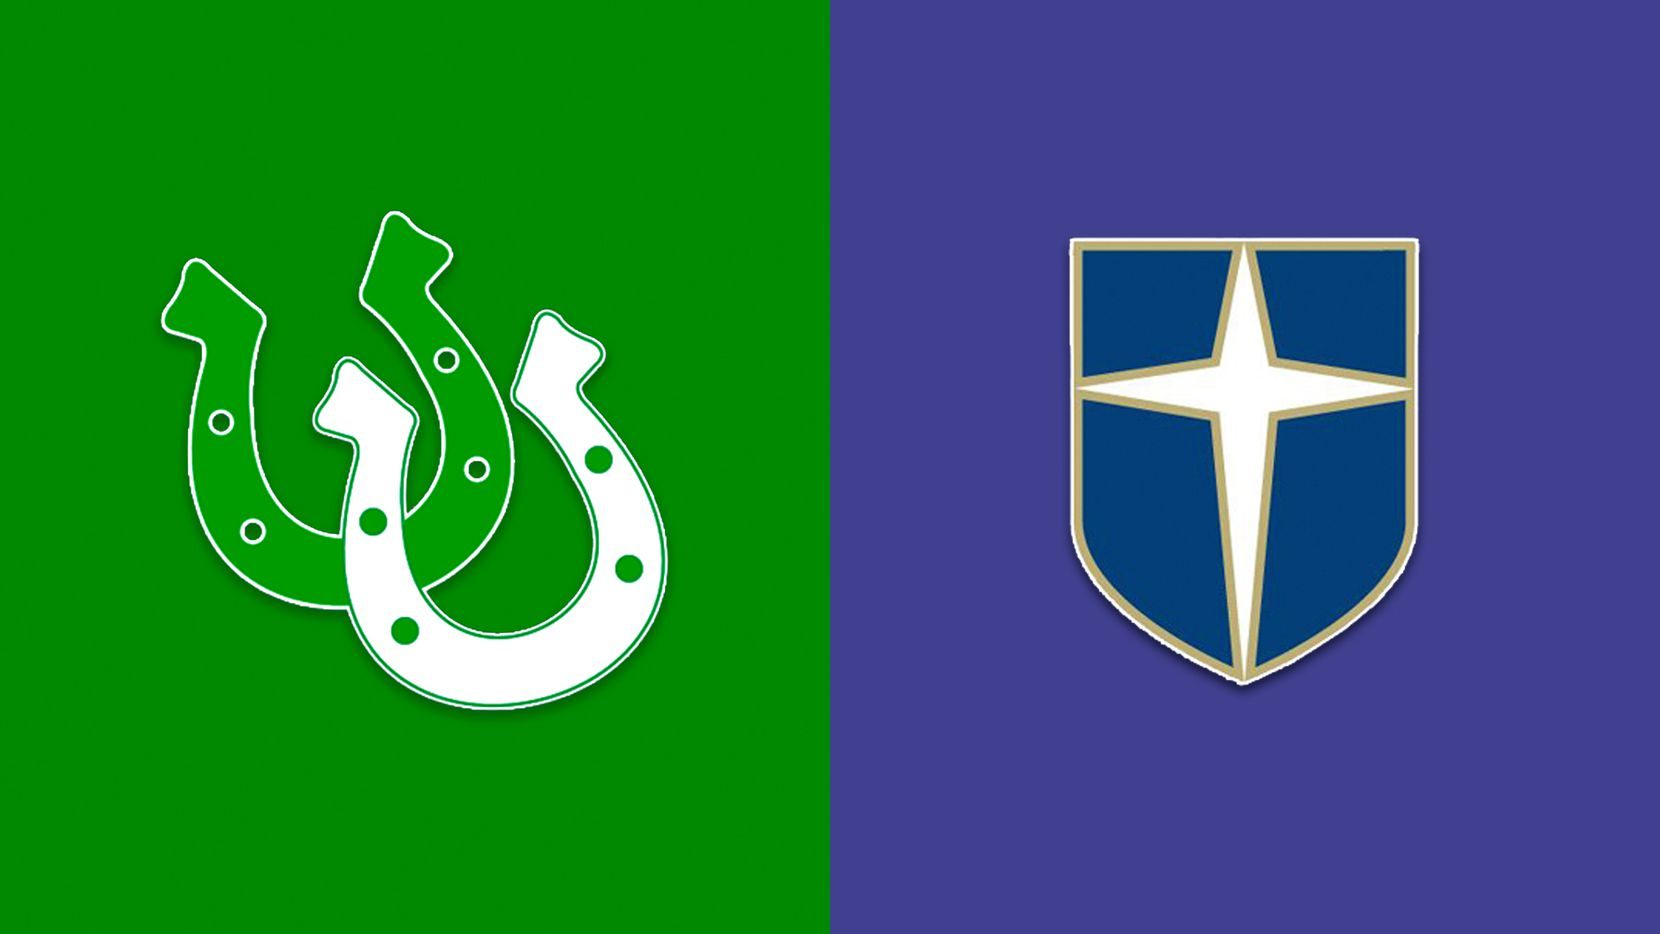 Arlington vs. Jesuit.